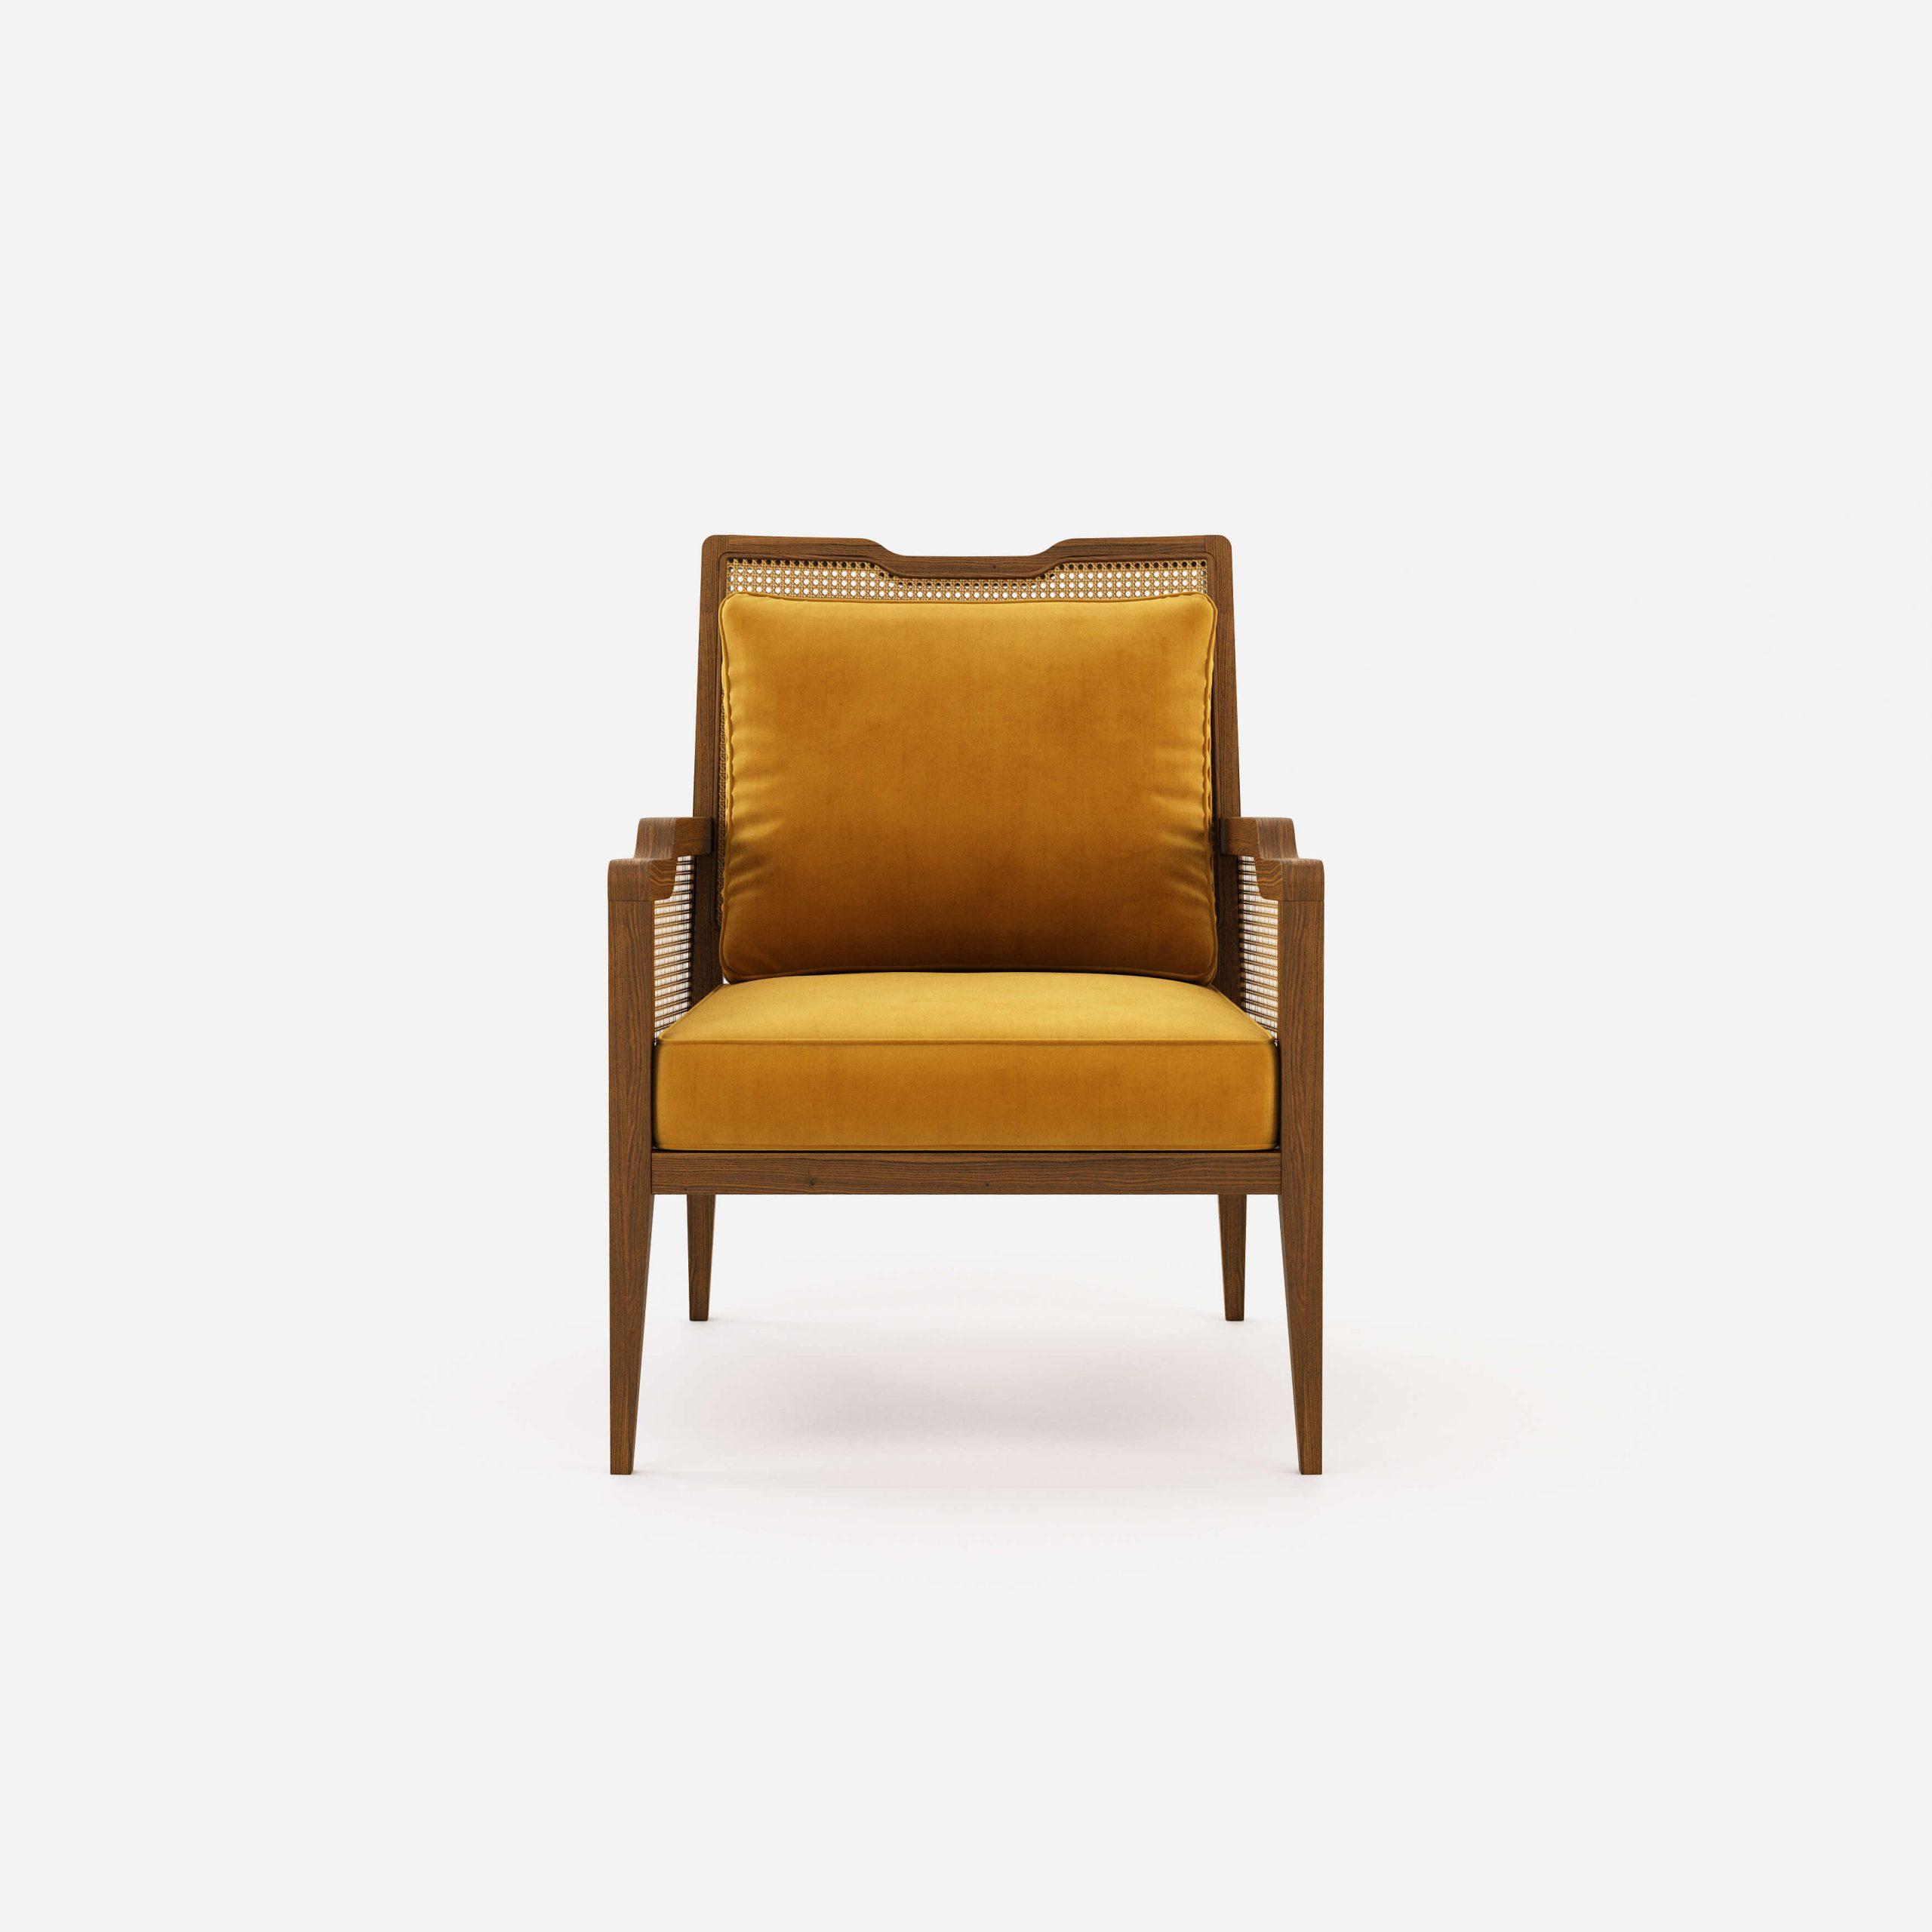 eva-armchair-cotton-velvet-mostaza- natural-woven-work-ash-living-room-home-decor-domkapa-1